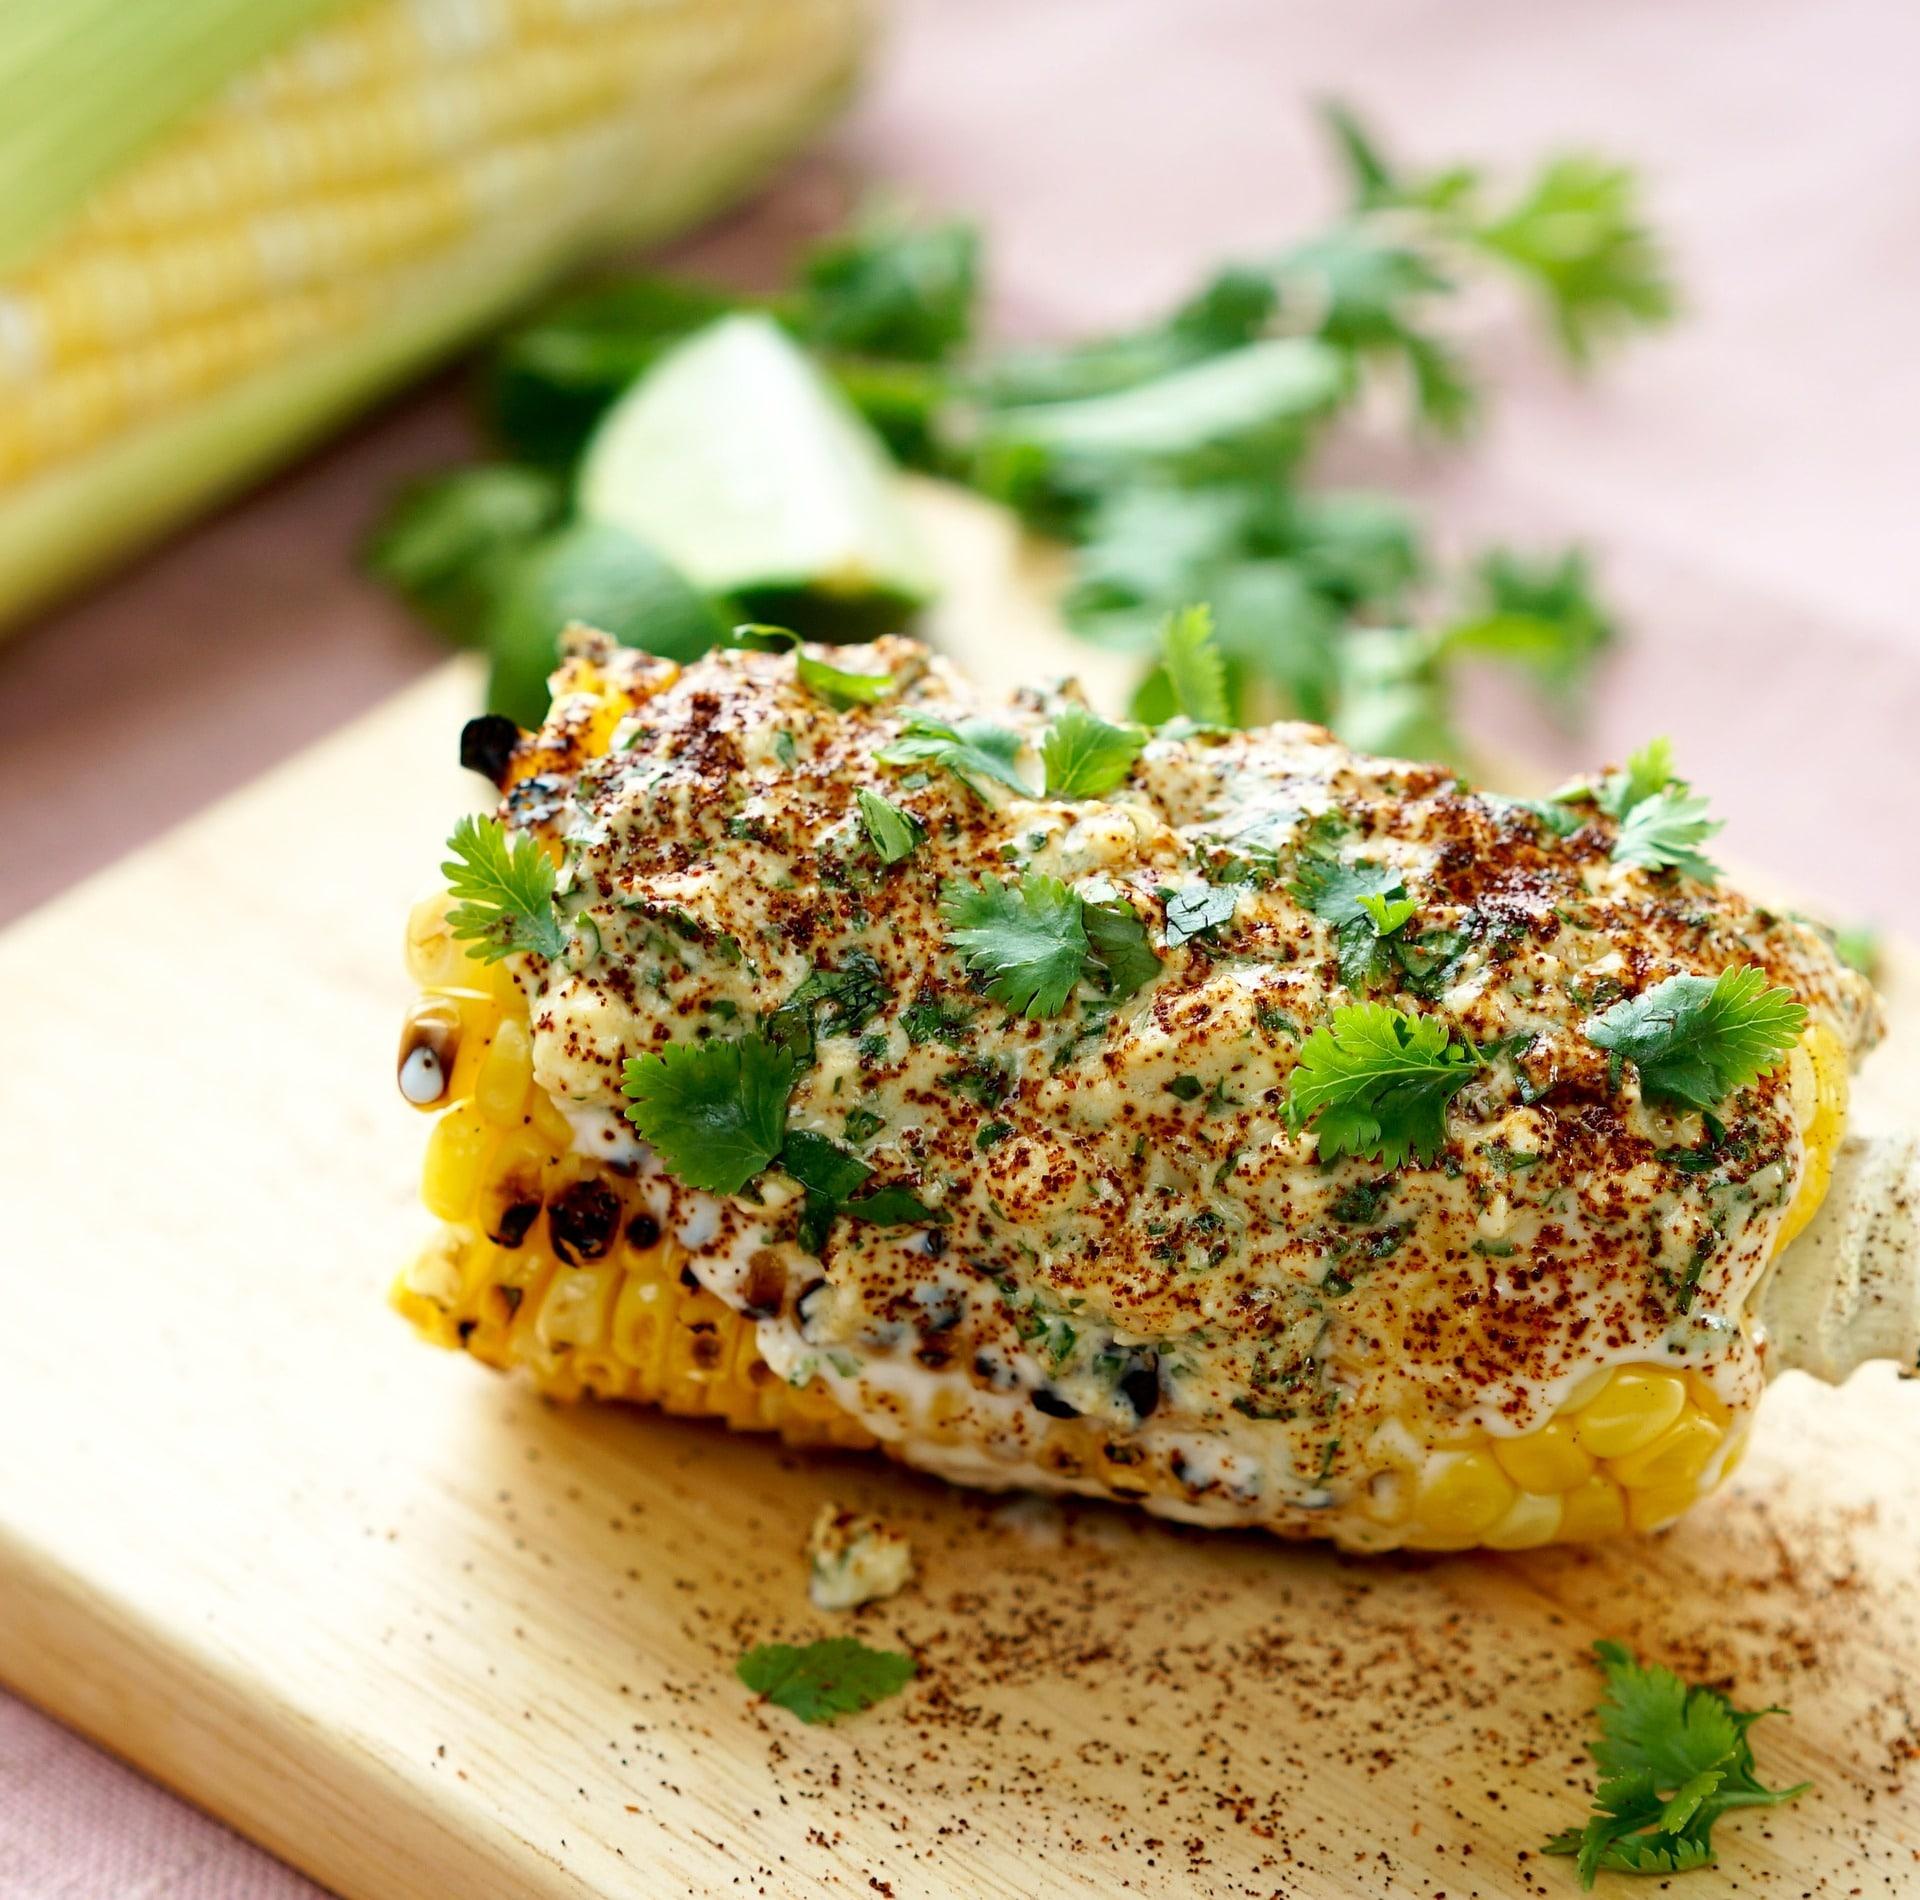 Grilled Mexican Street Corn Recipe via @mermaidsandmojitos